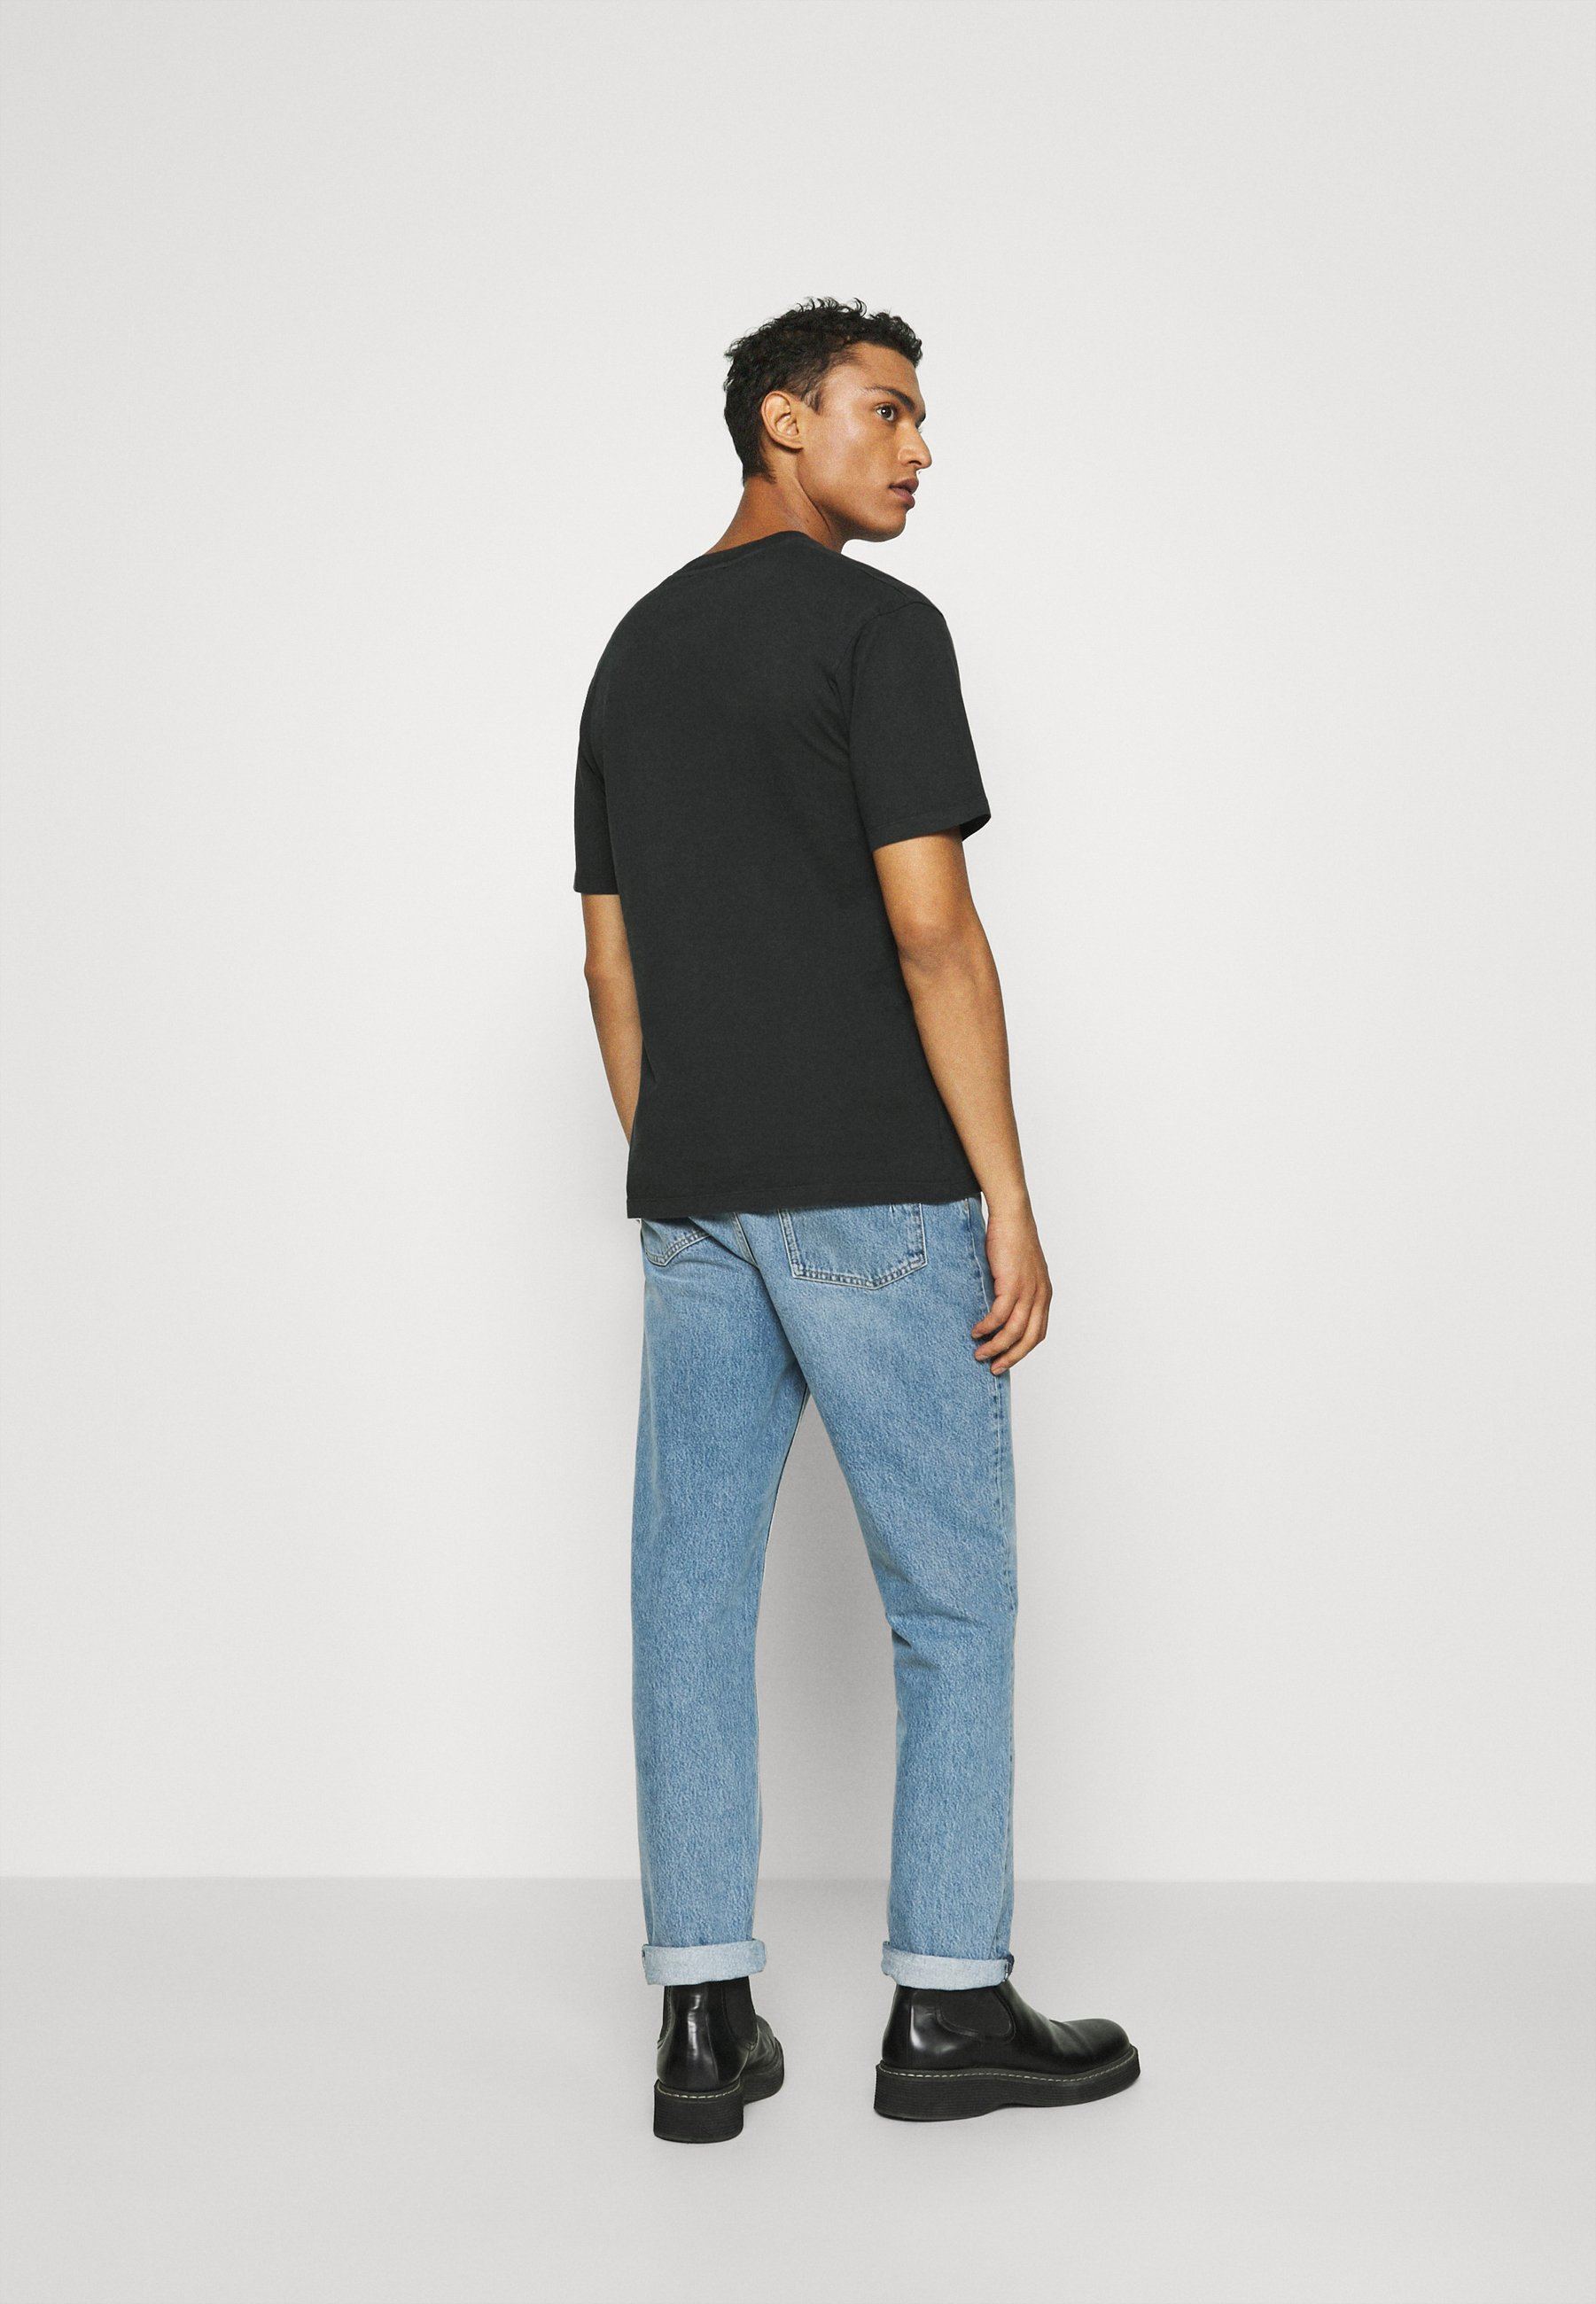 The Kooples T-shirt Print - Black